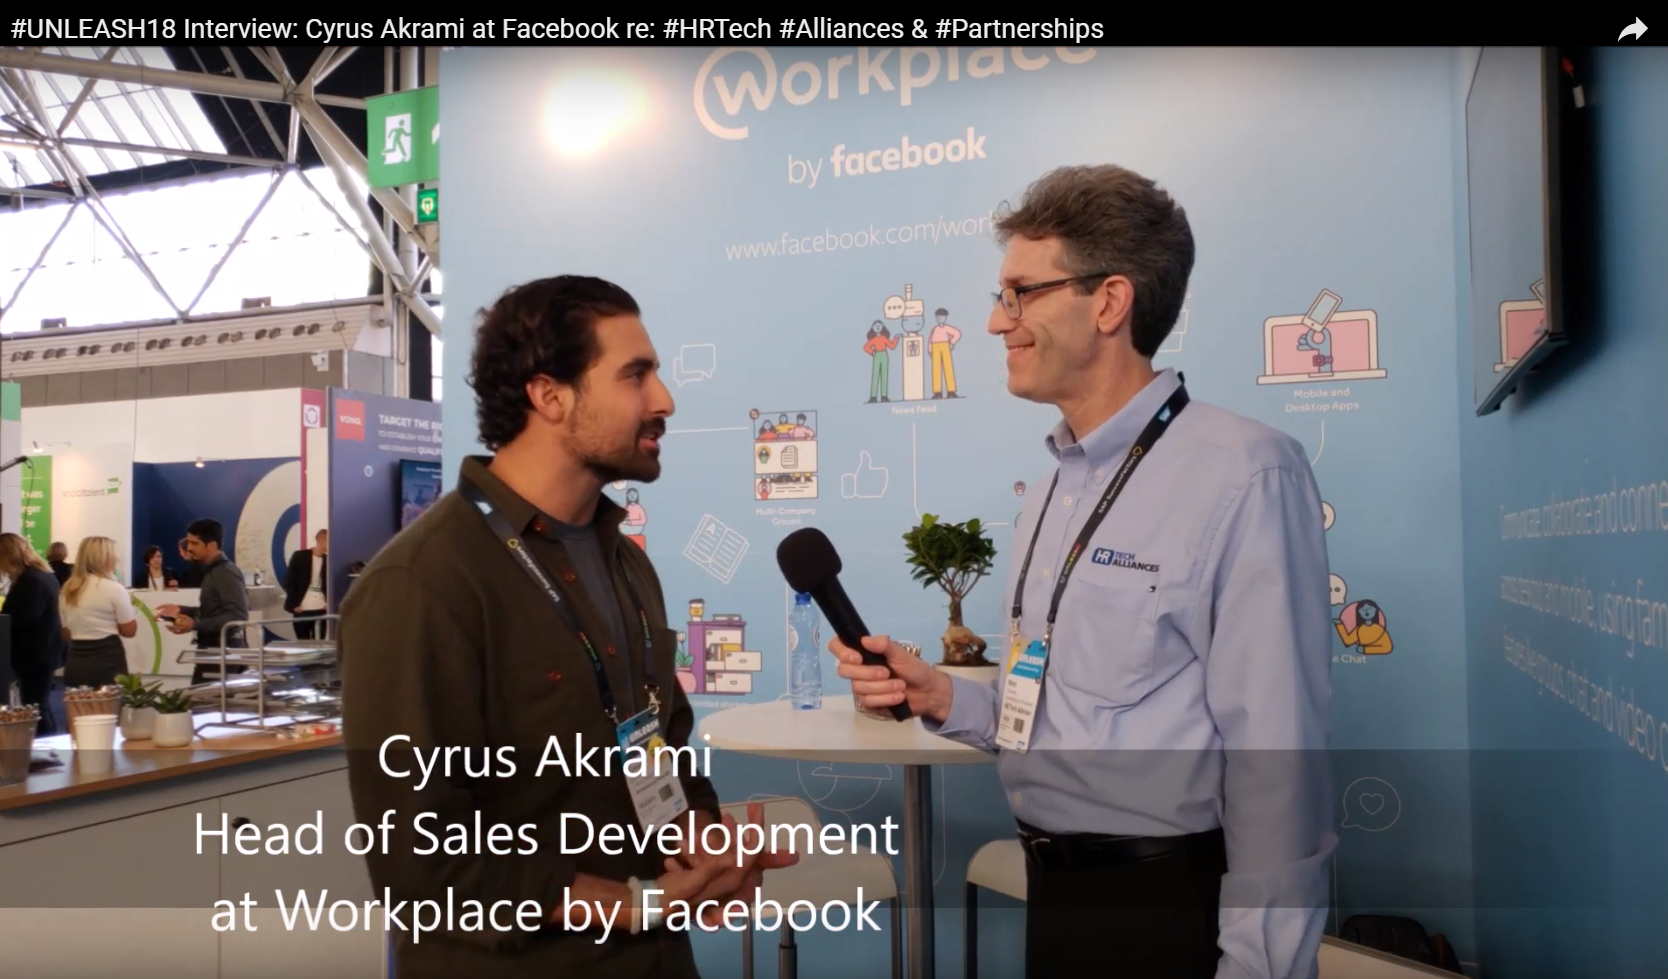 Cyrus Akrami @Facebook #HRTech #Alliances Video #Interview #UNLEASH18 #Partnerships @CAkrami @HRTechAdvisor